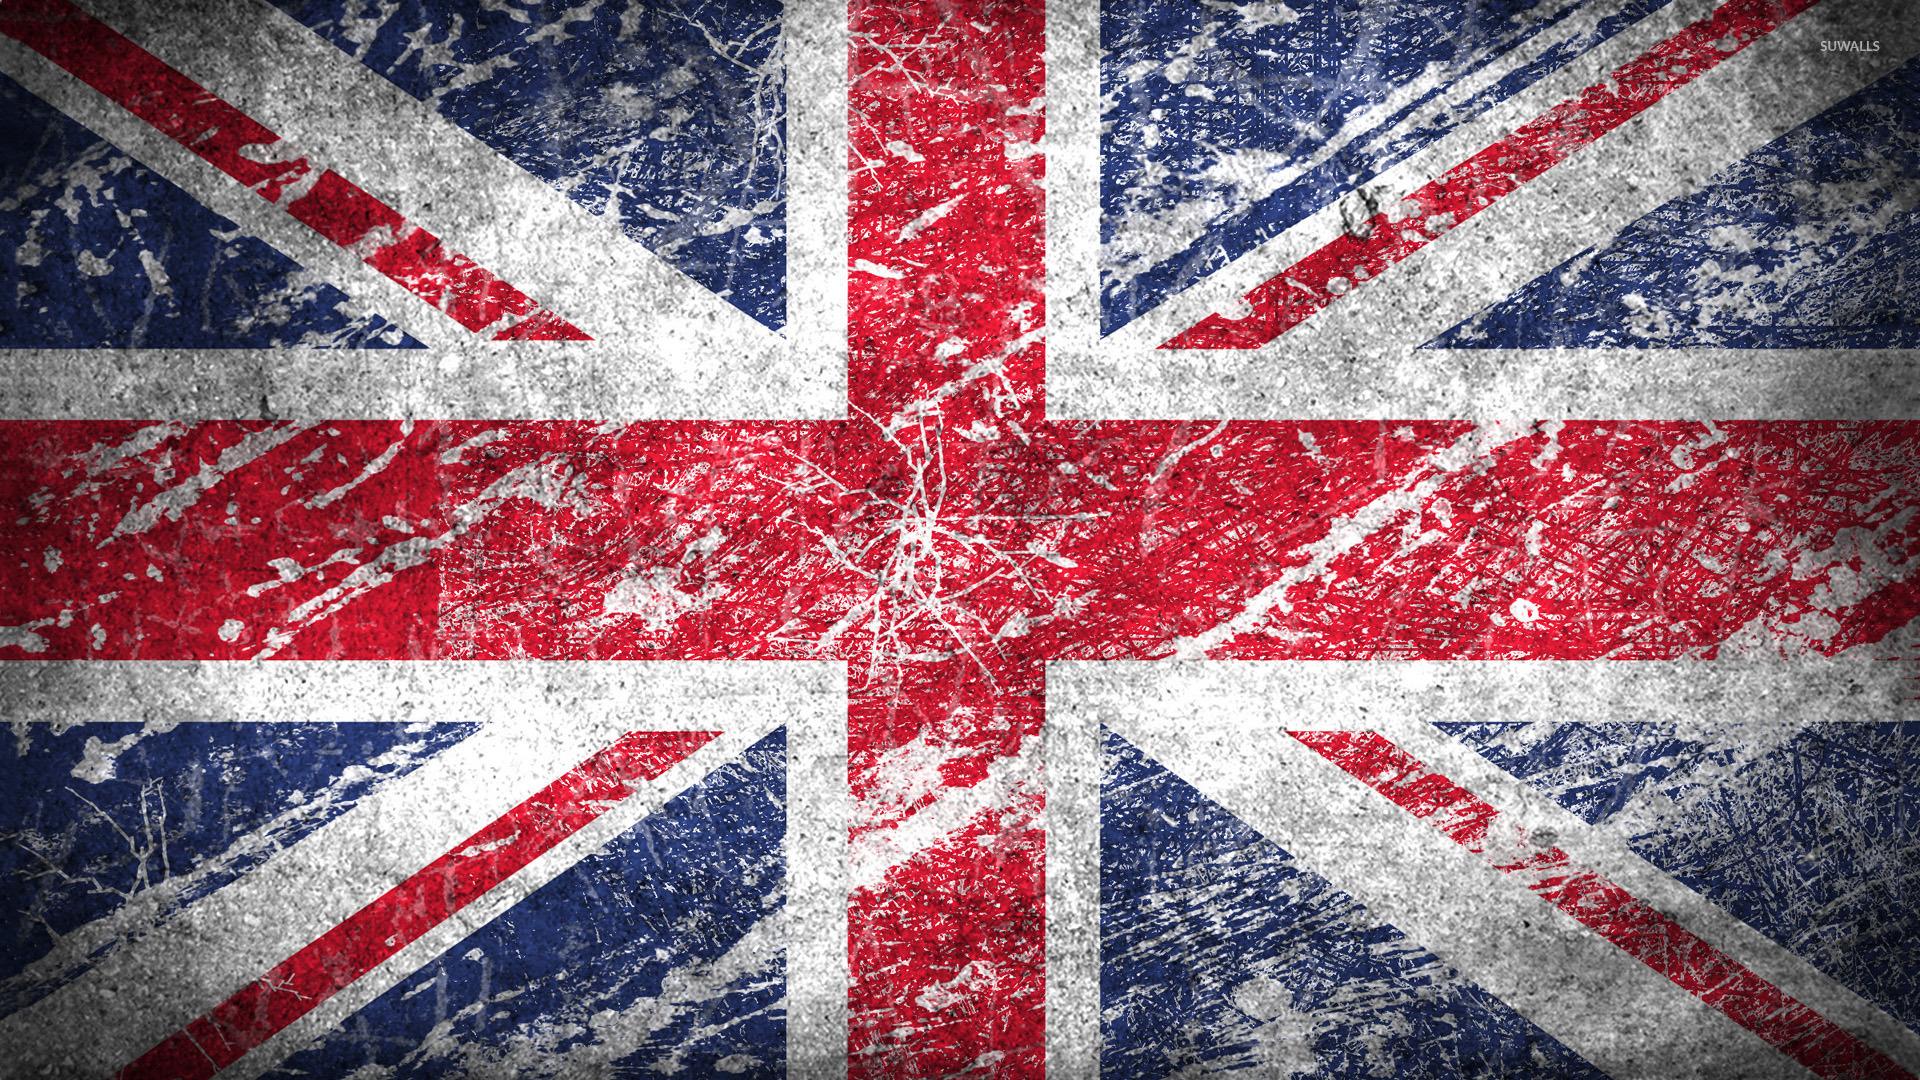 flag of england wallpaper - digital art wallpapers - #45794